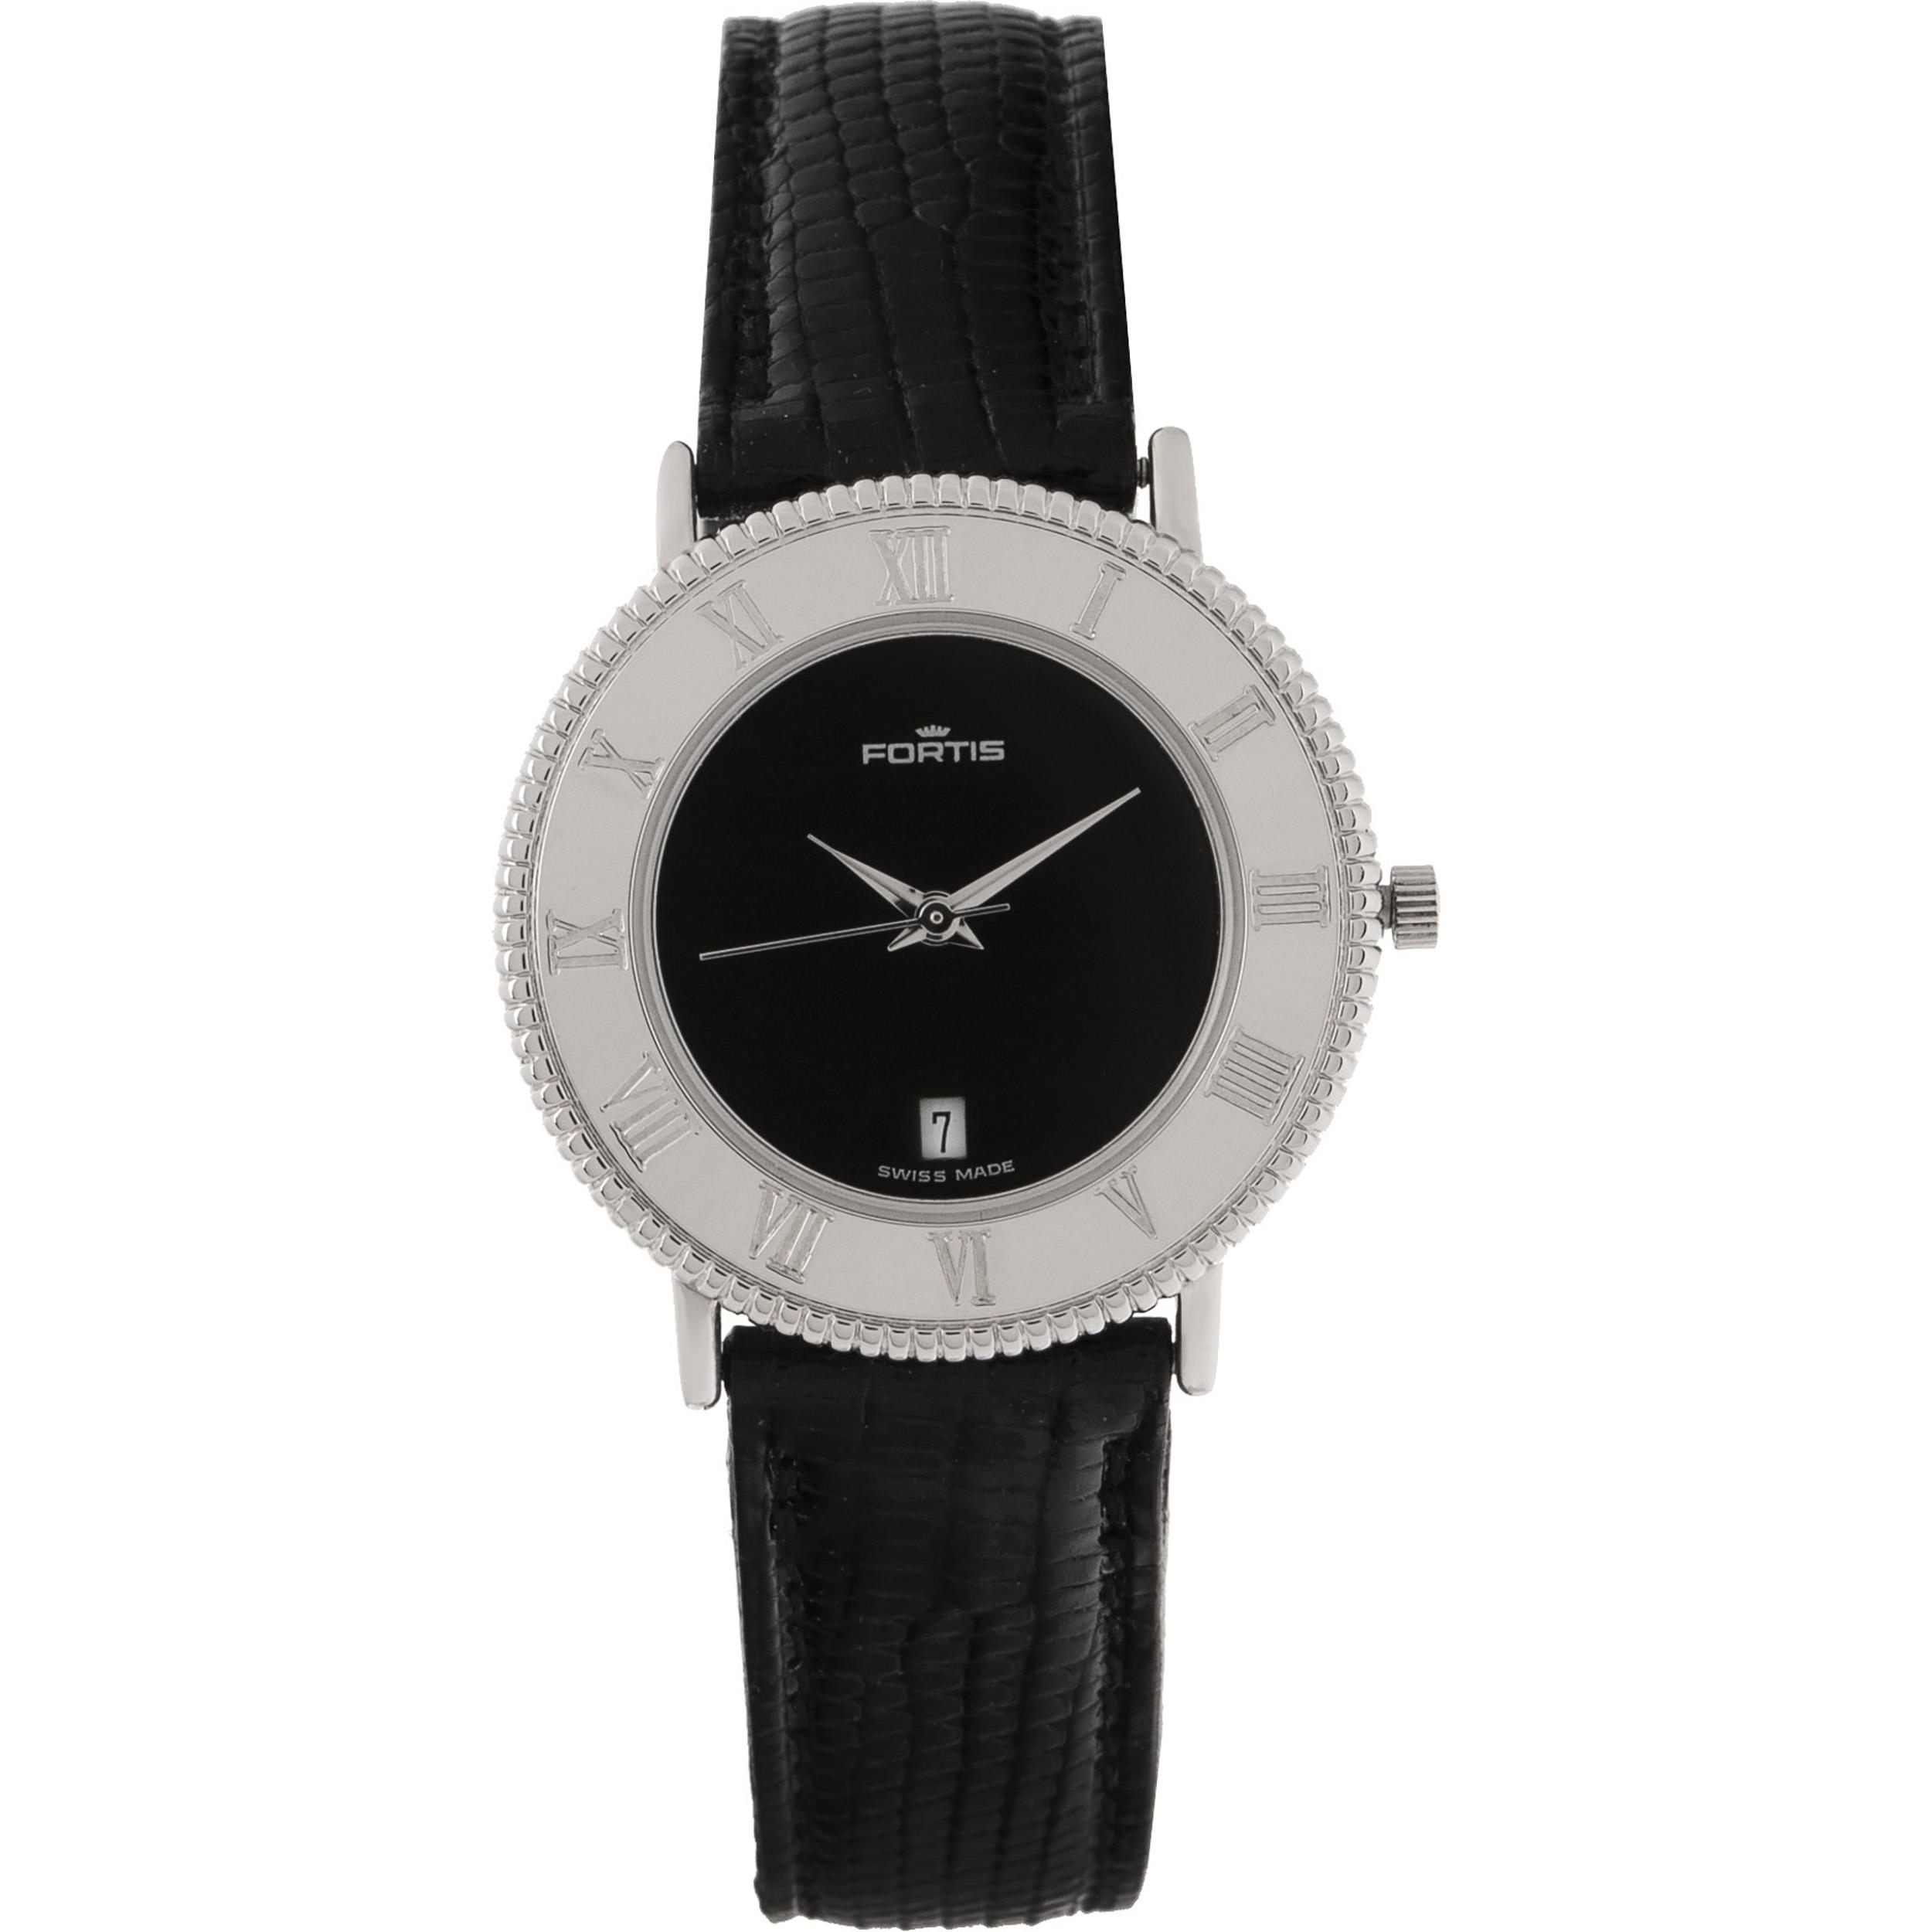 ساعت زنانه برند فورتیس مدل F 522.20.01